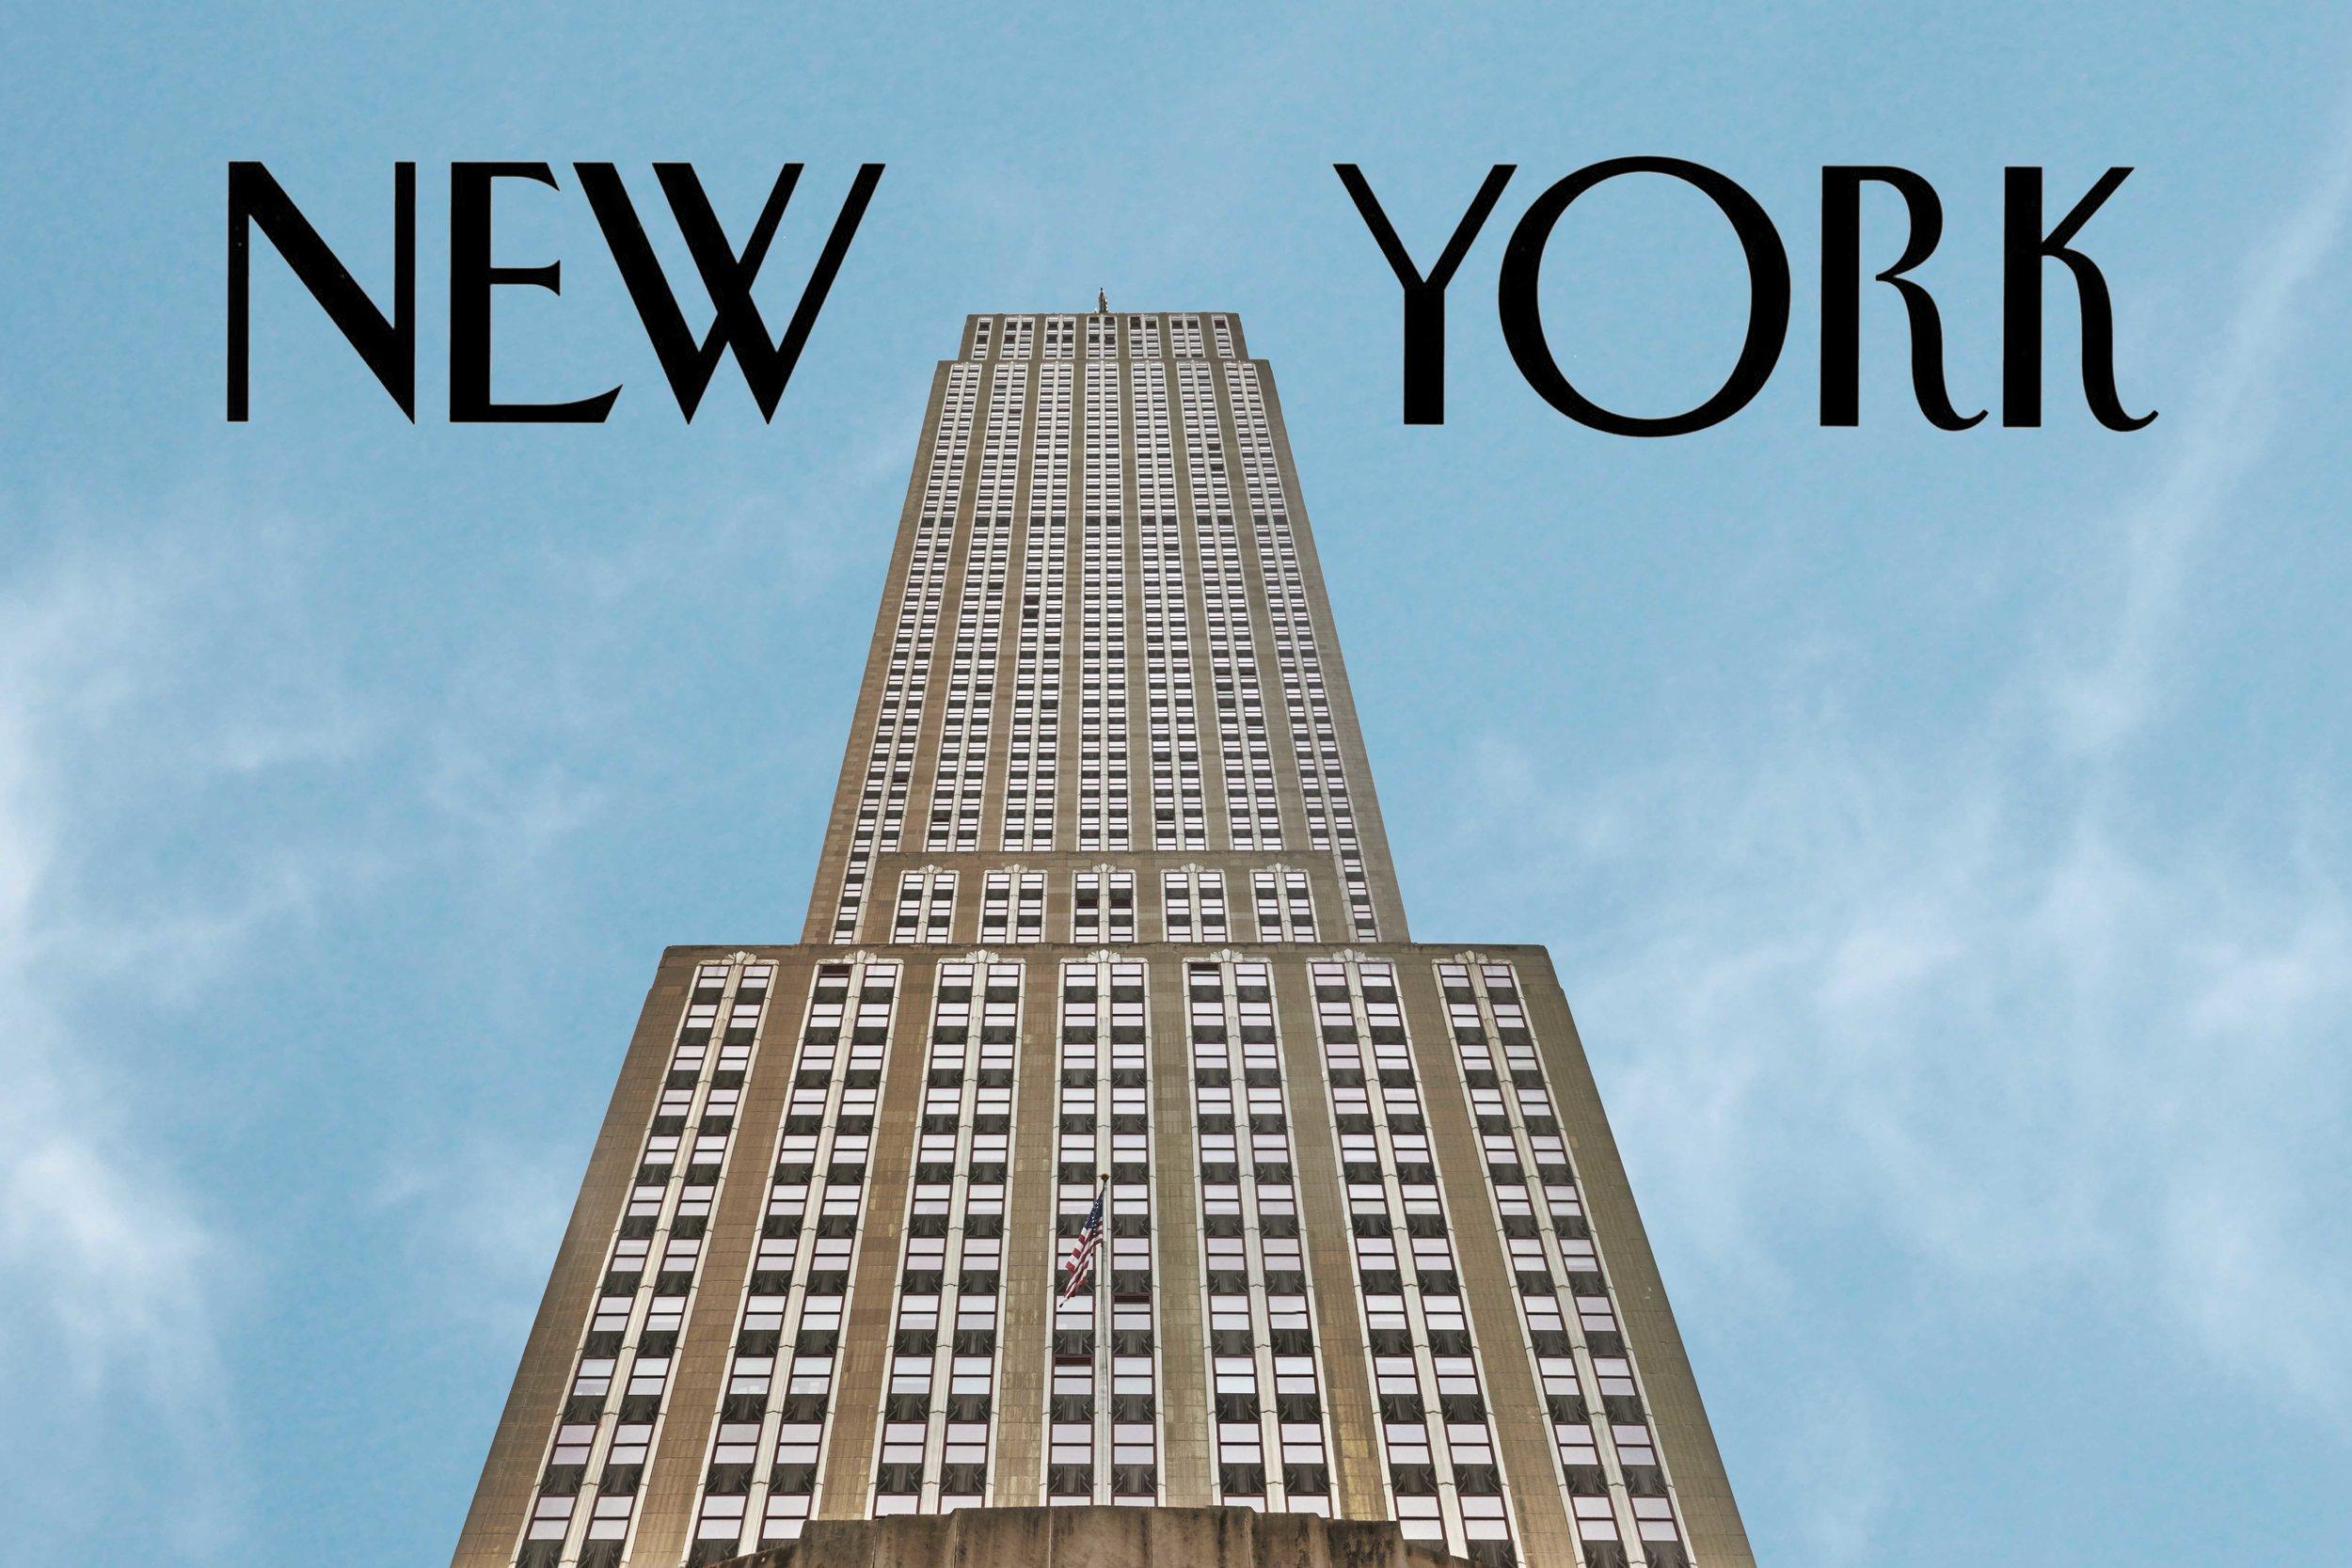 New_York_title_web.jpg